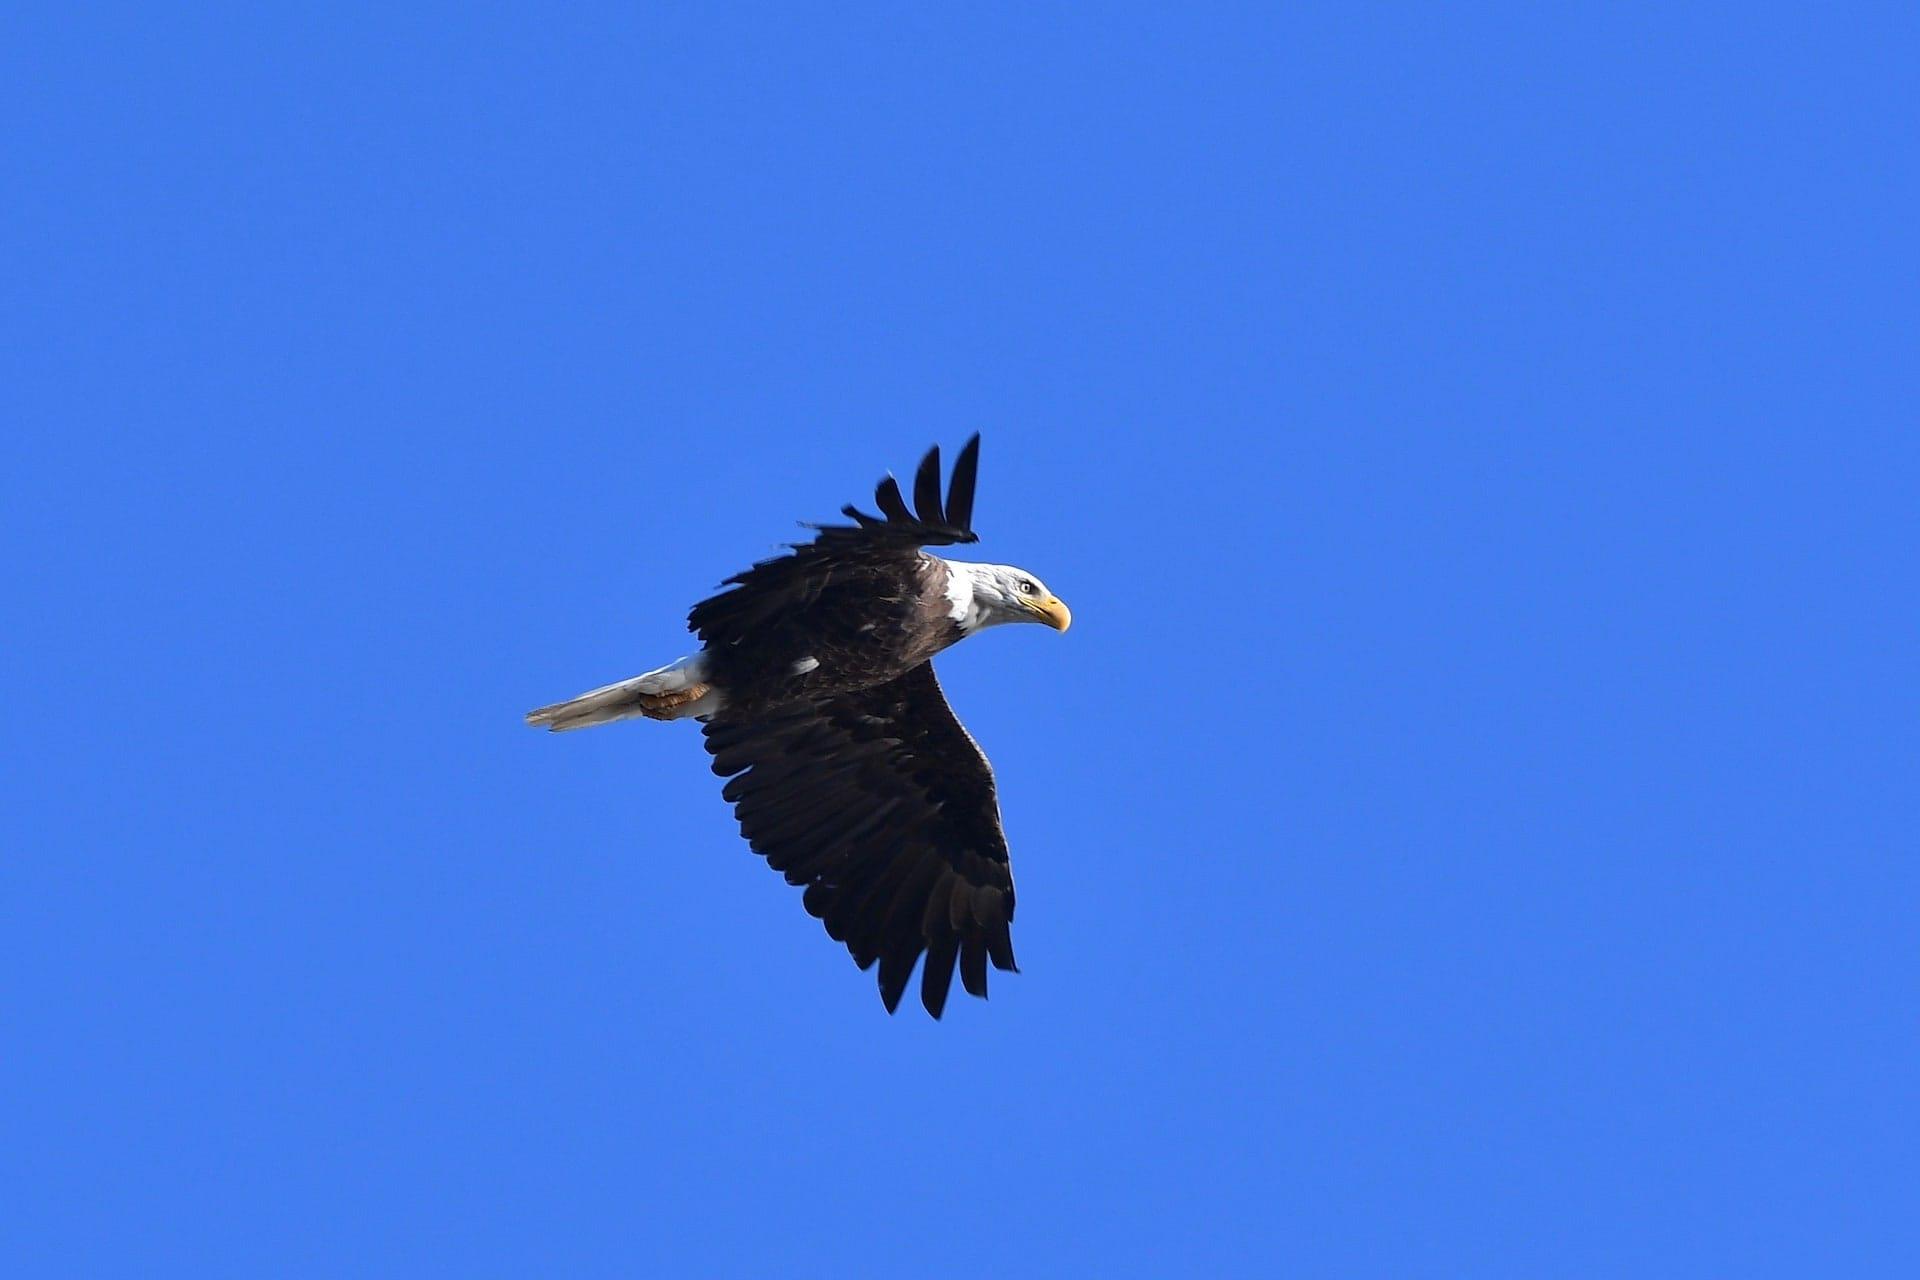 D300 Nikon with eagle